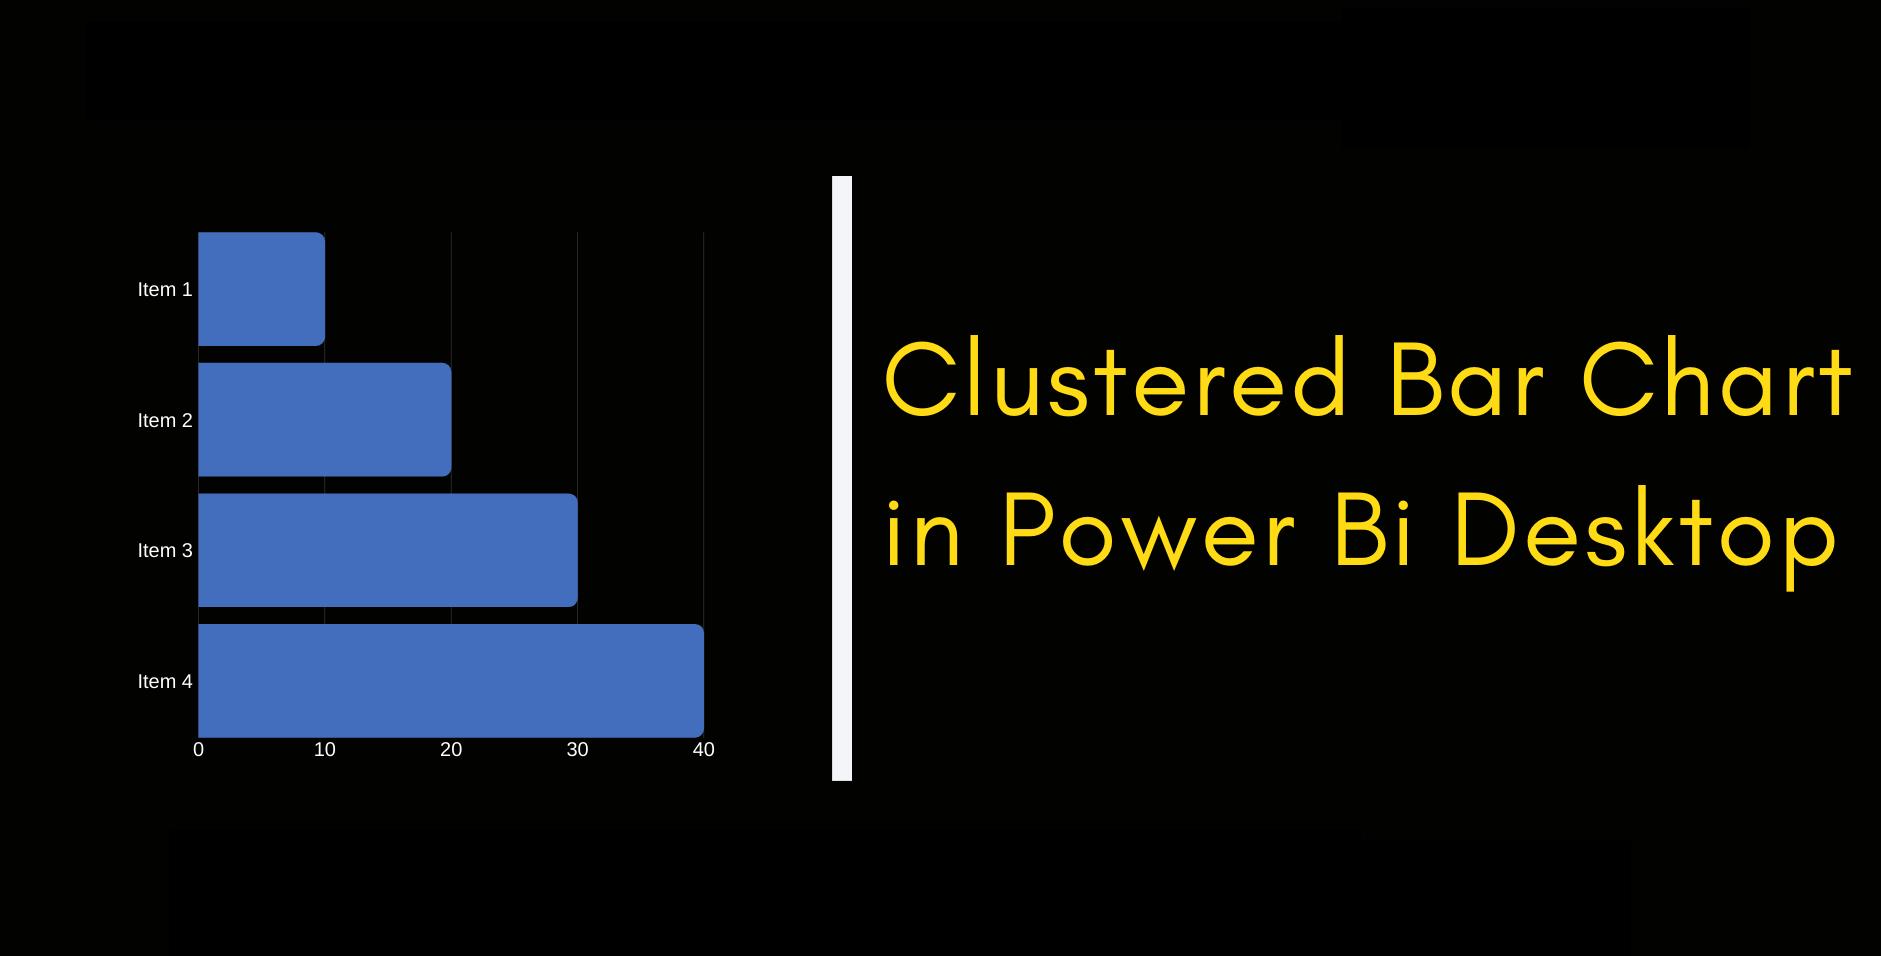 Clustered Bar Chart in Power Bi Desktop